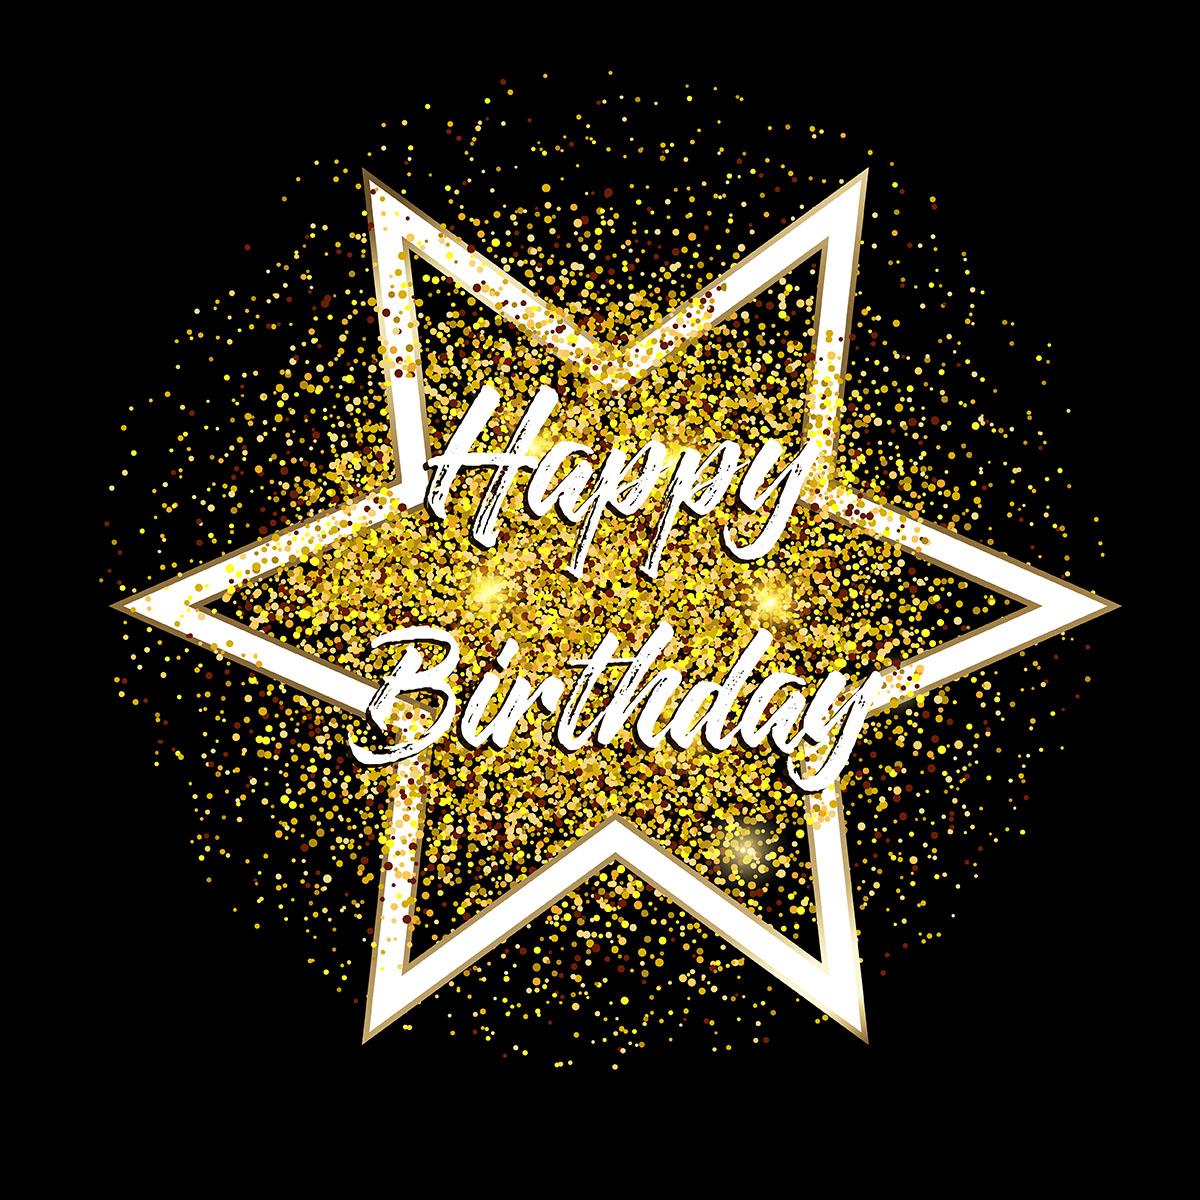 Gold glitter happy birthday background - Download Free ...